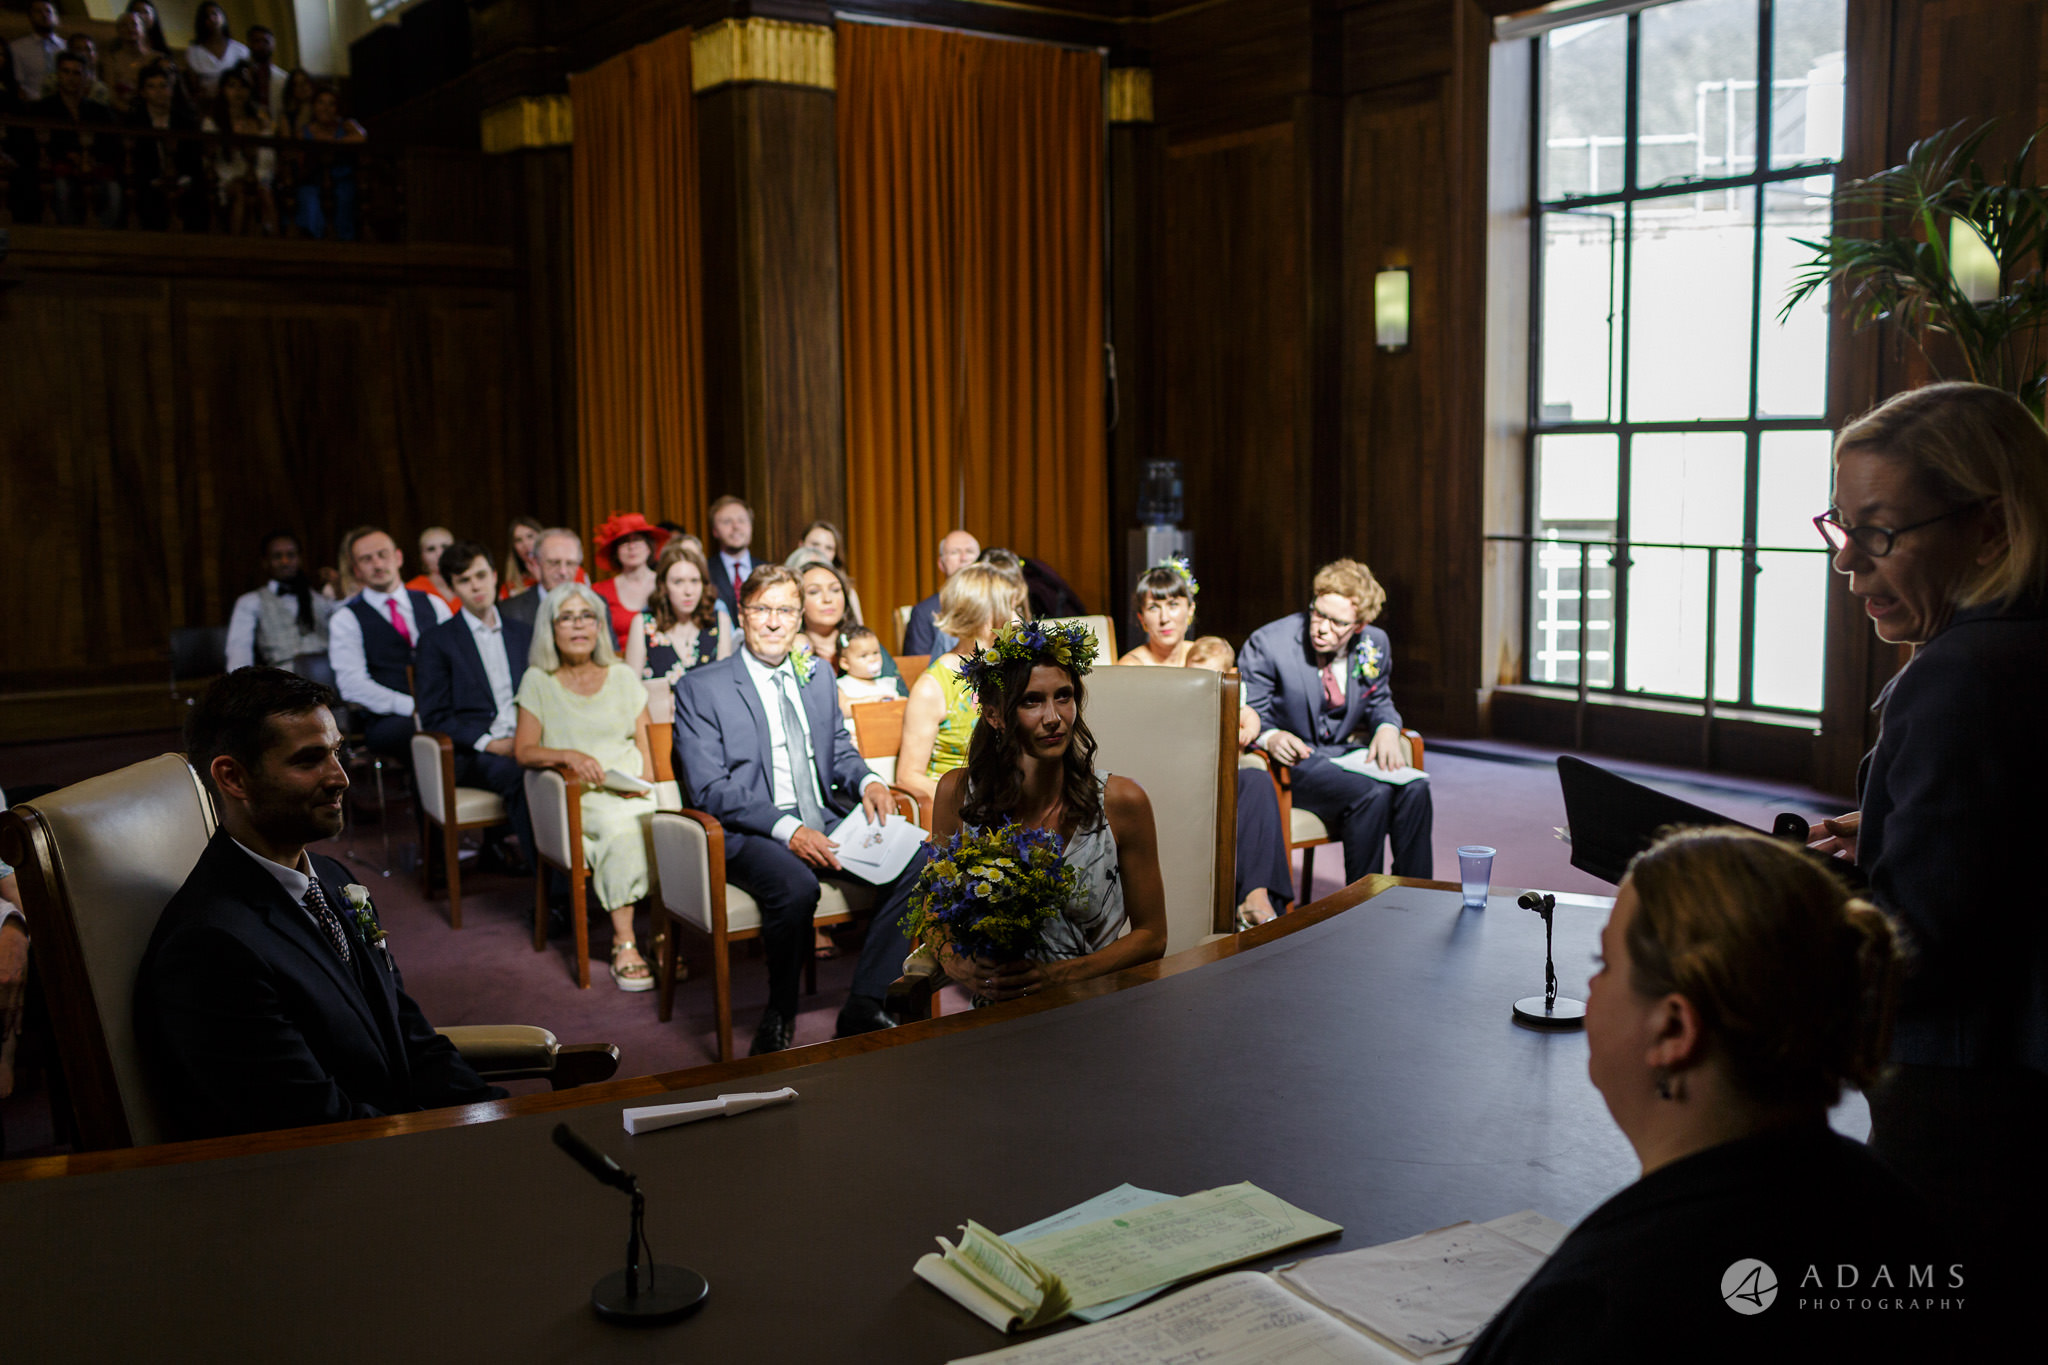 Clissold house wedding ceremony